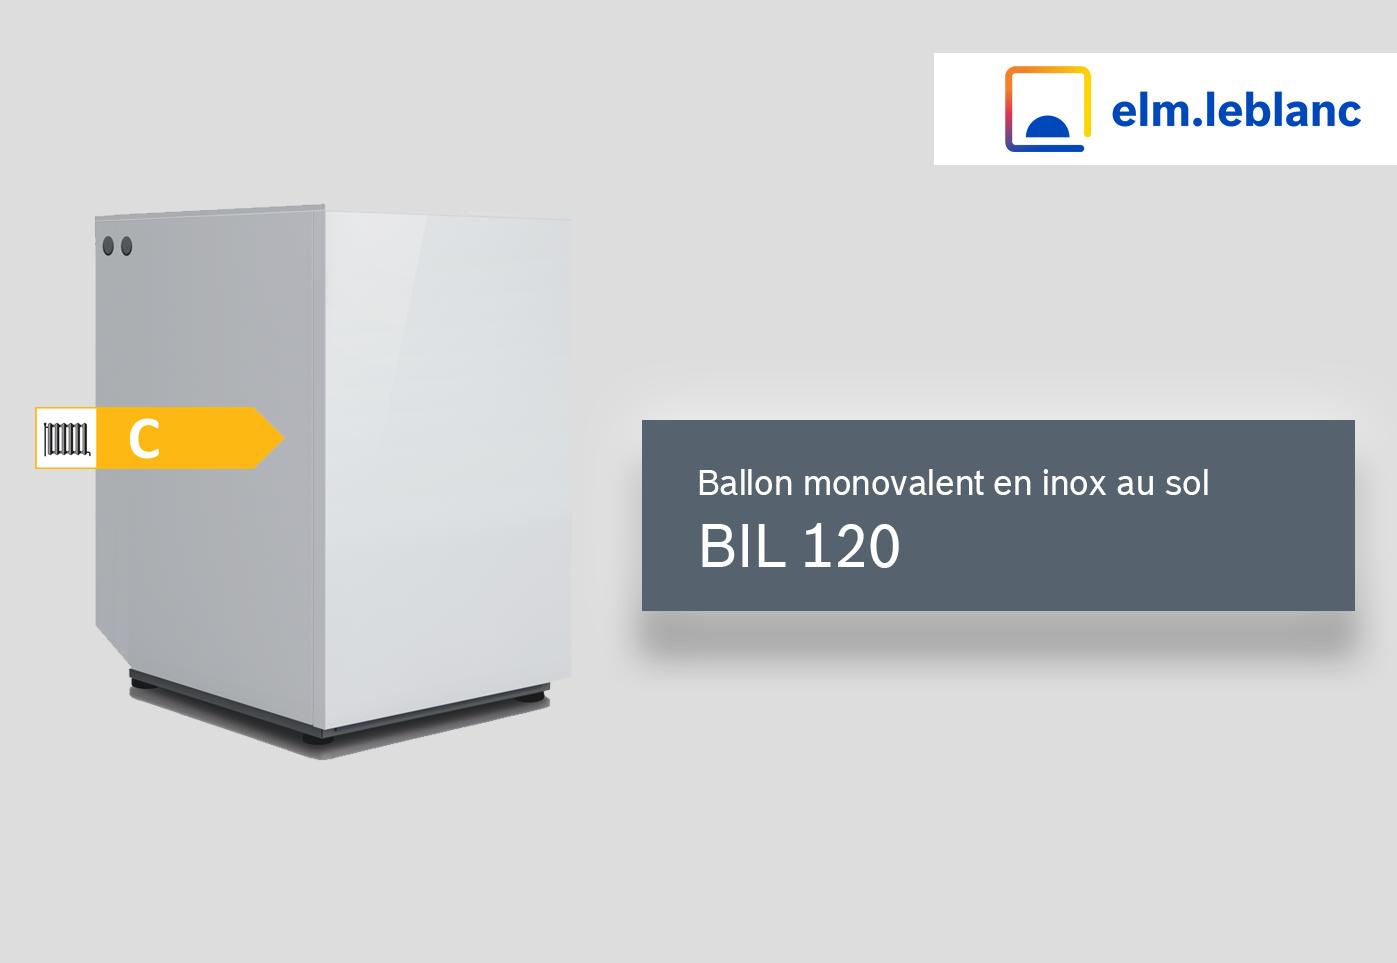 BIL 120